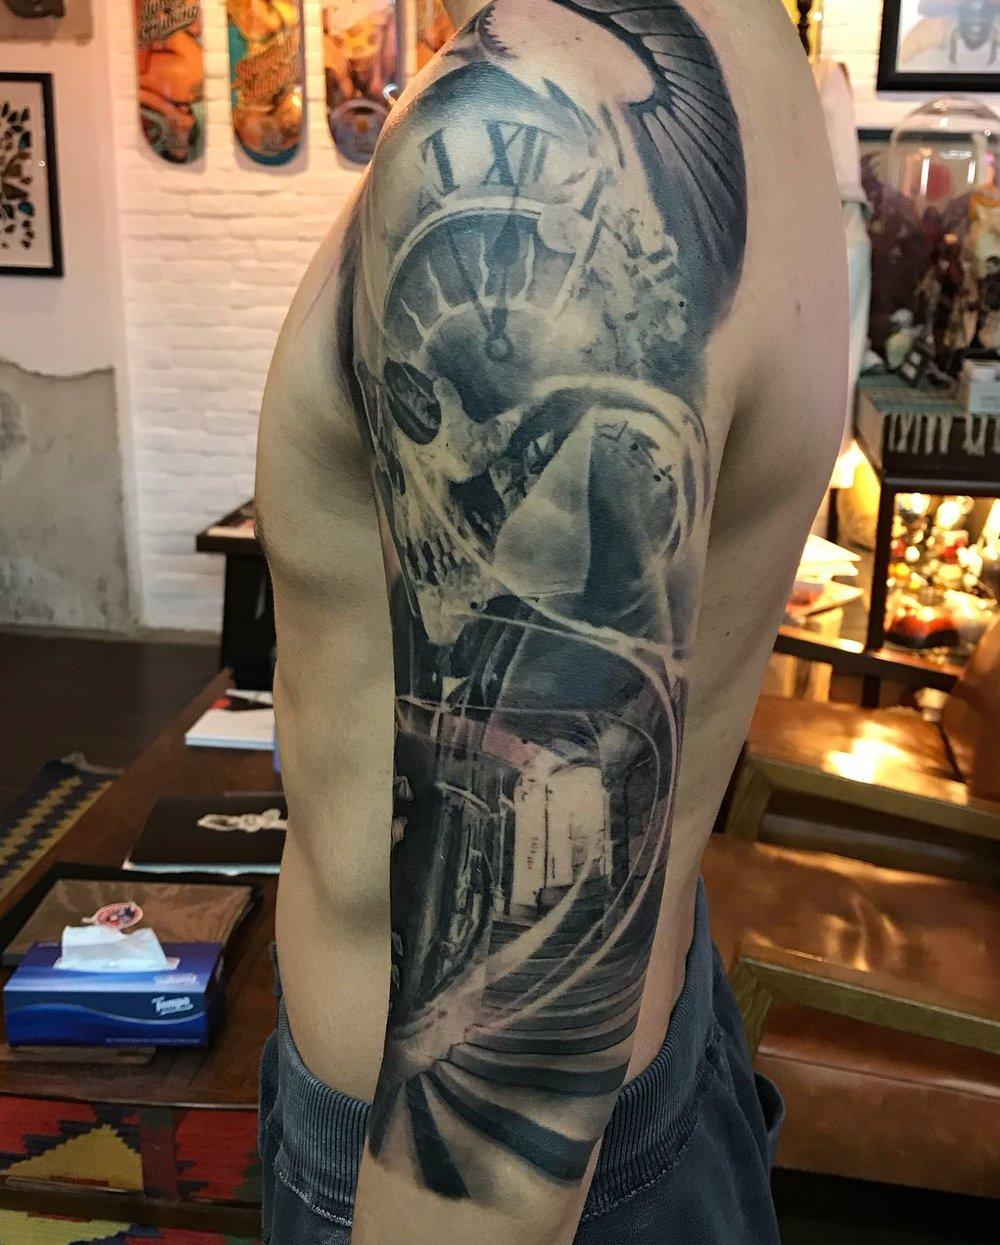 2018-fridays-tattoo-hong-kong-jamie-graphic-skull-time-sleeve-1.jpg